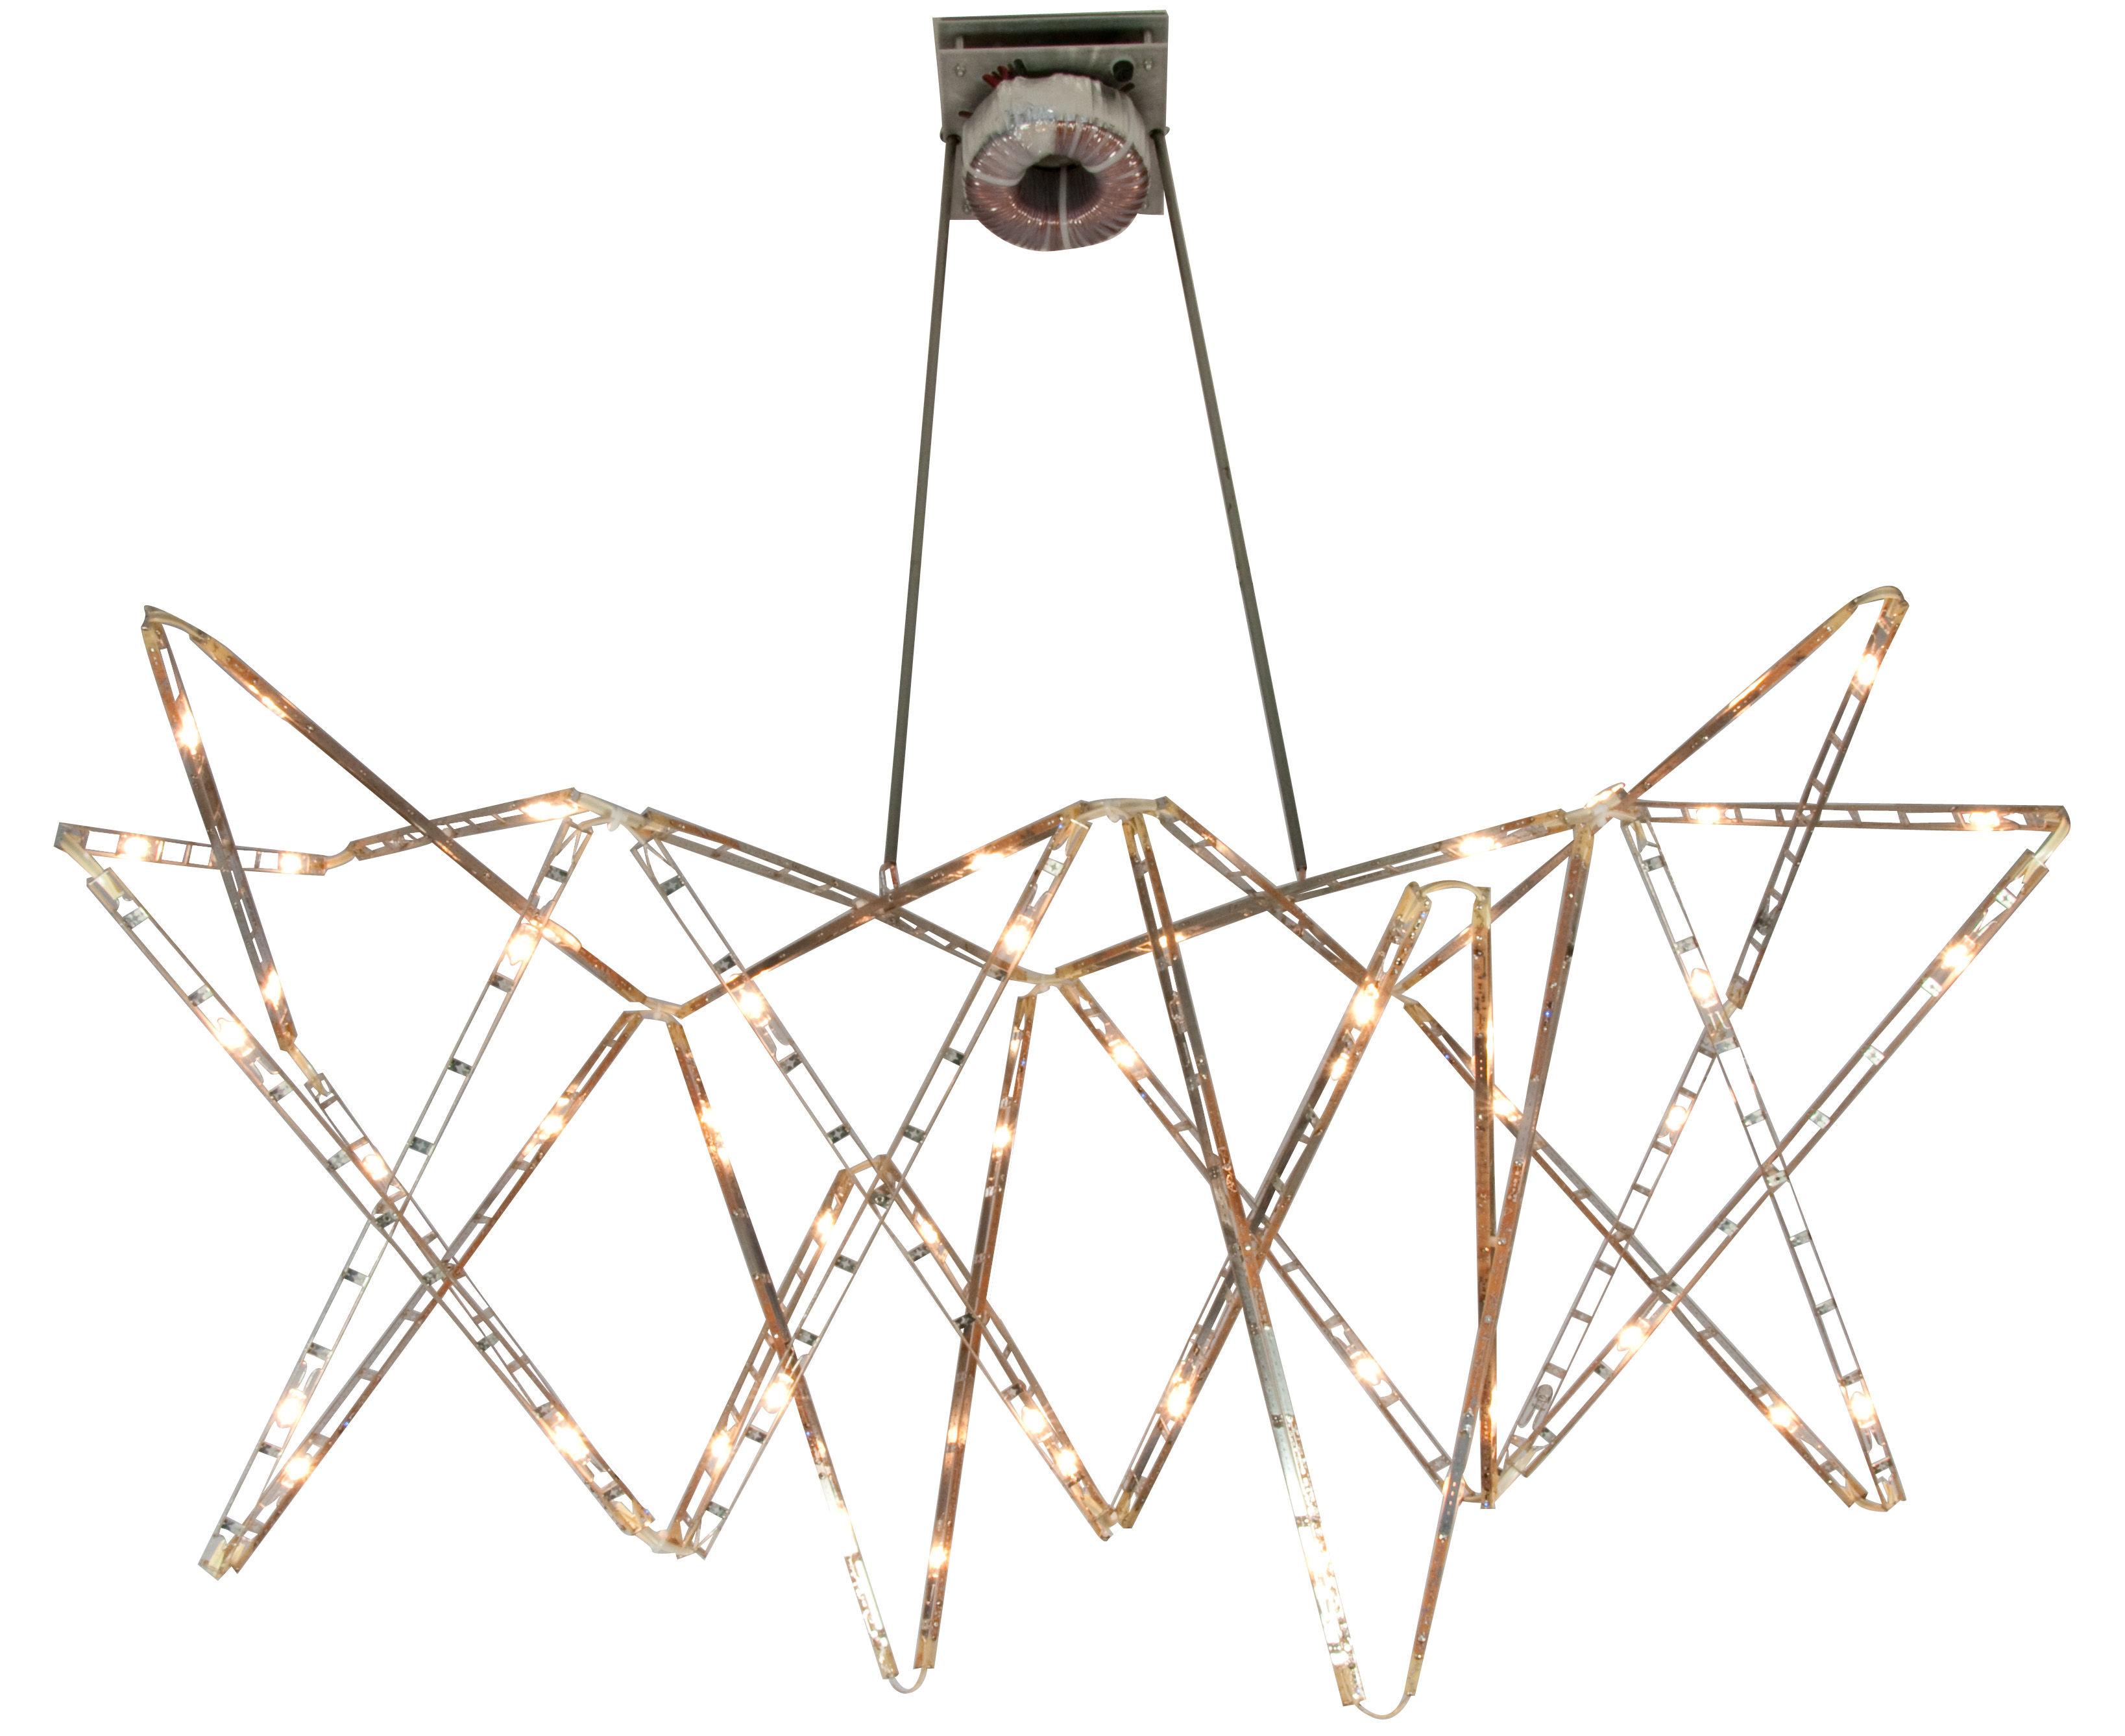 Leuchten - Pendelleuchten - Vaisseau céleste Pendelleuchte mit Gelenken - Tsé-Tsé - Edelstahl - rostfreier Stahl